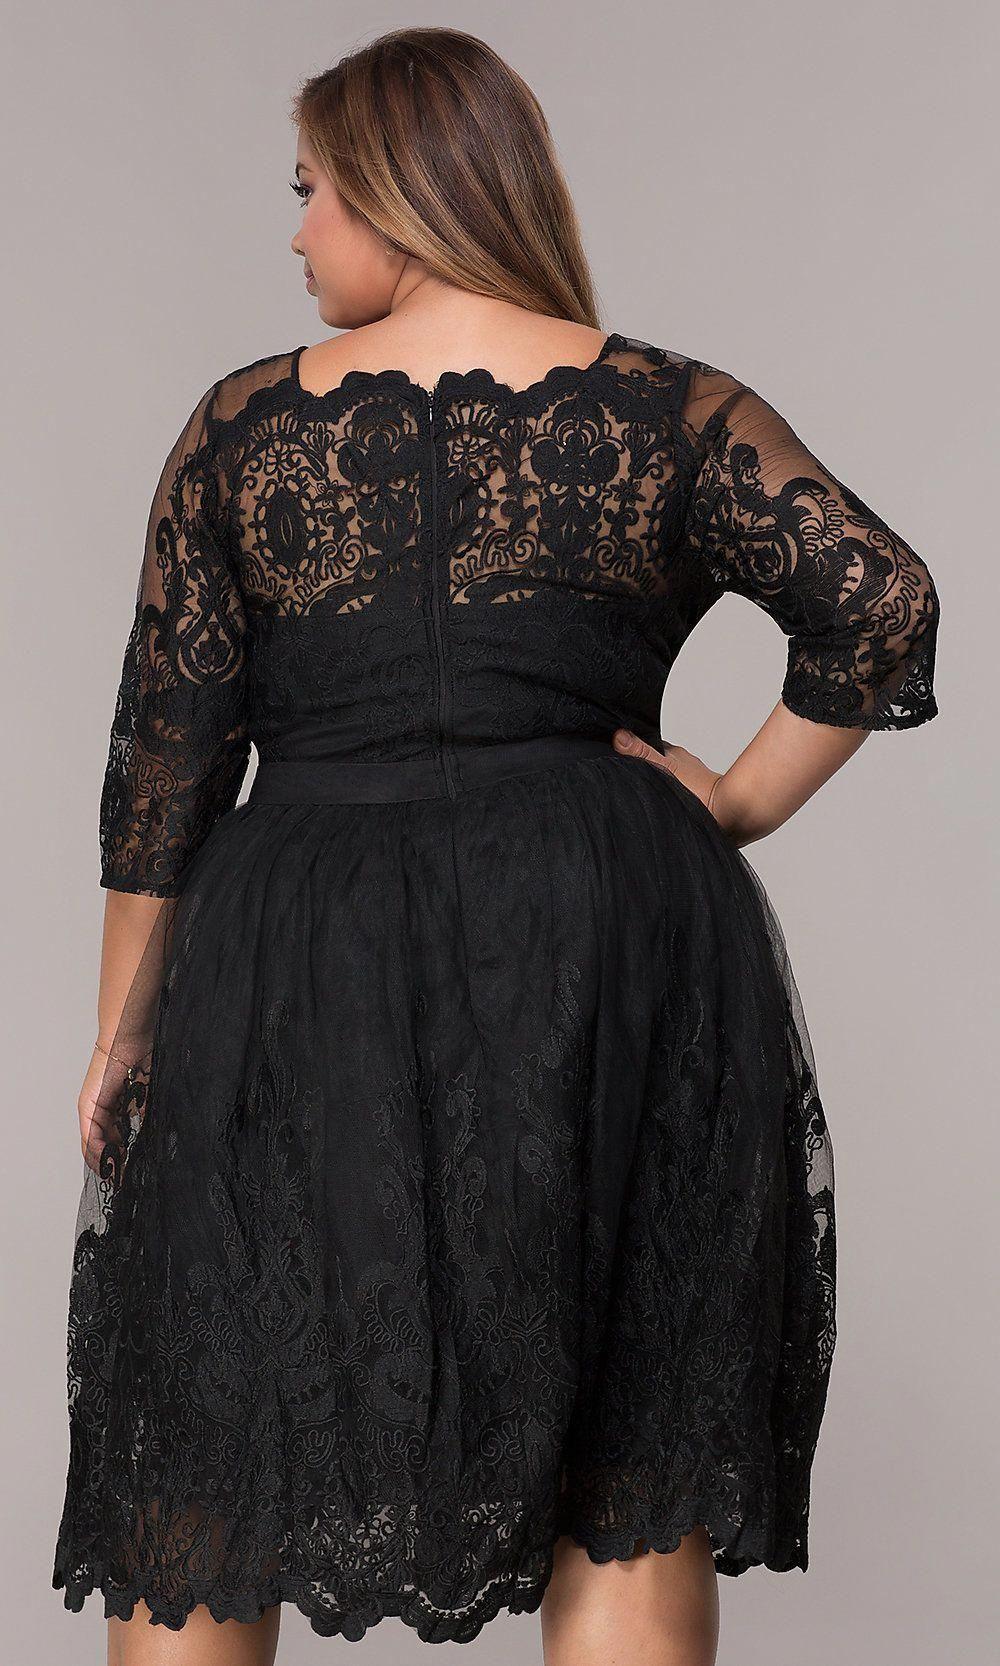 Short Lace Plus Size 3 4 Sleeve Wedding Guest Dress Plus Size Party Dresses Wedding Guest Dress Guest Dresses [ jpg ]